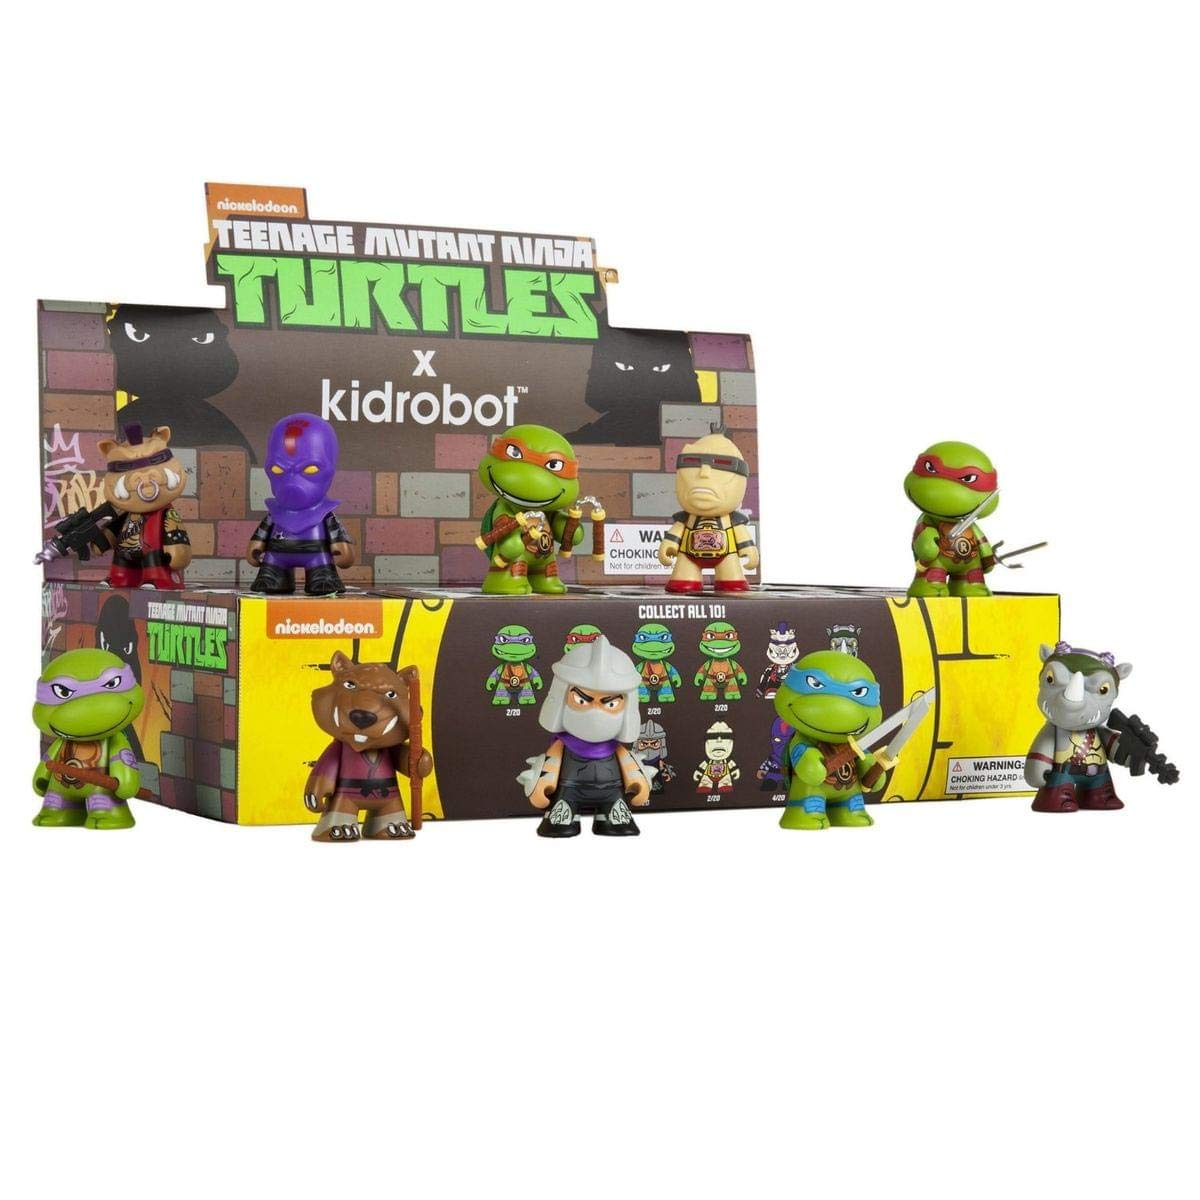 Amazon.com: Kidrobot X Teenage Mutant Ninja Turtles Mini ...